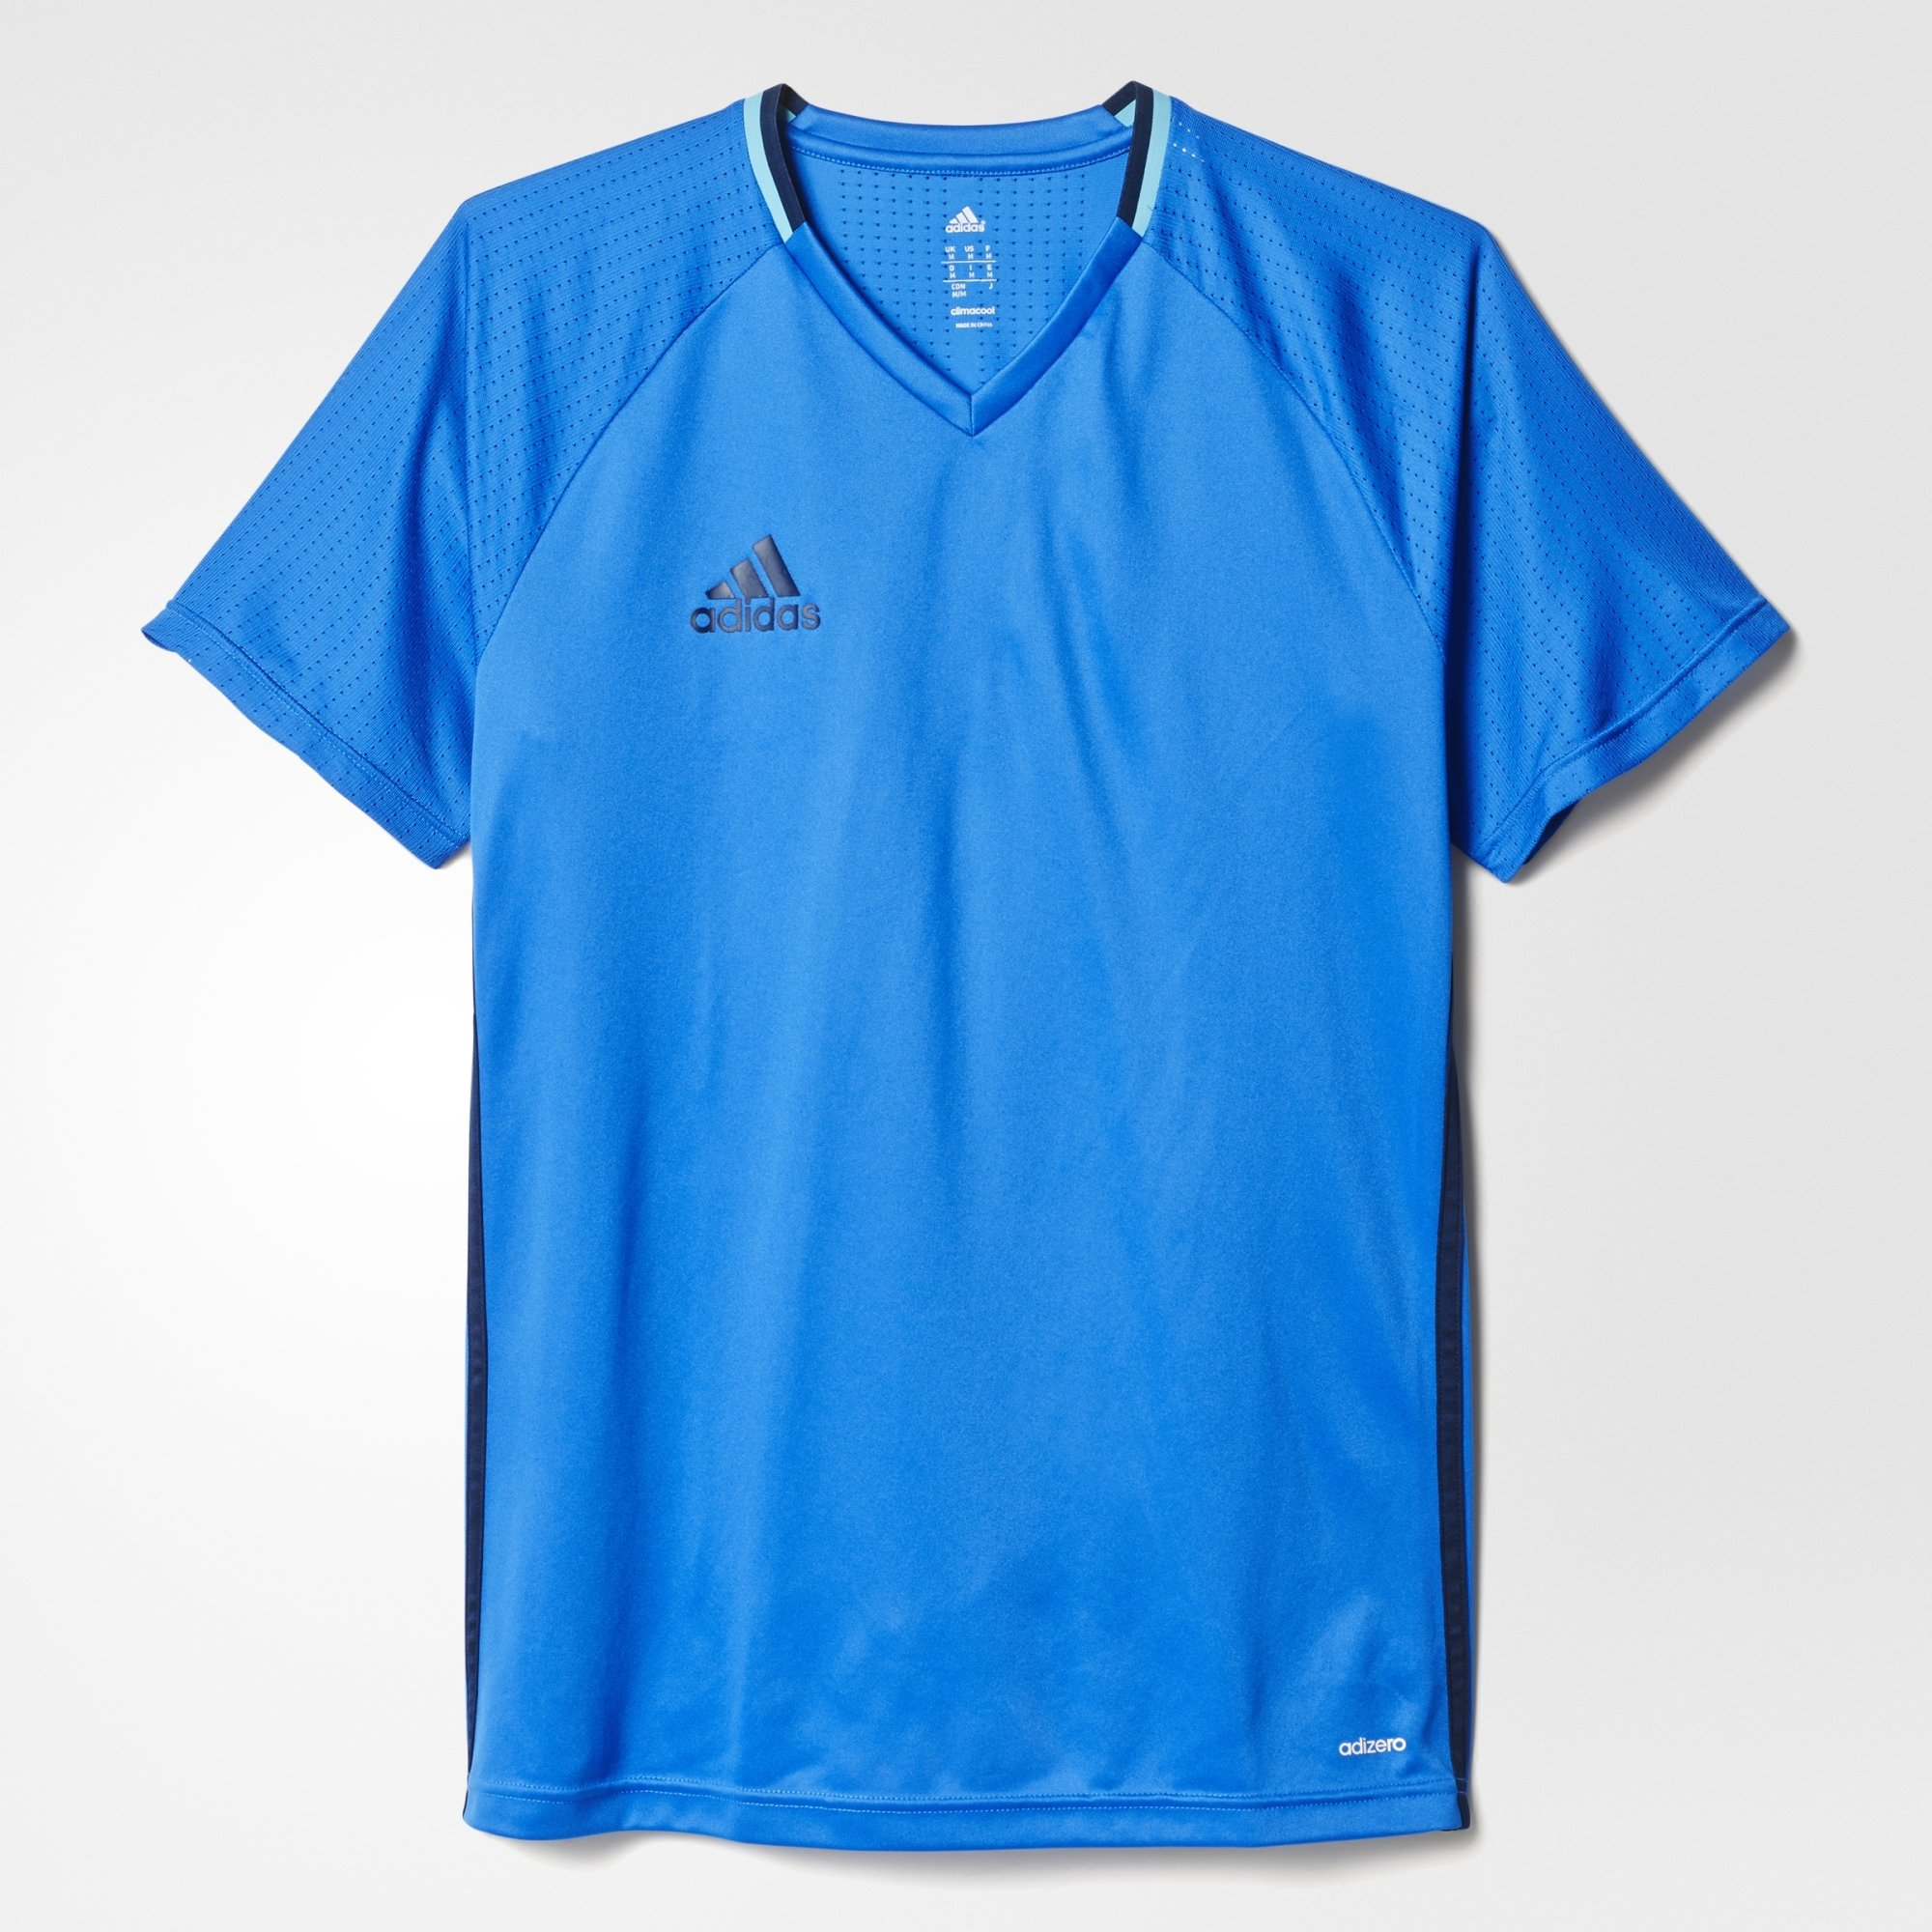 maillot adidas CON16 TRG JSY